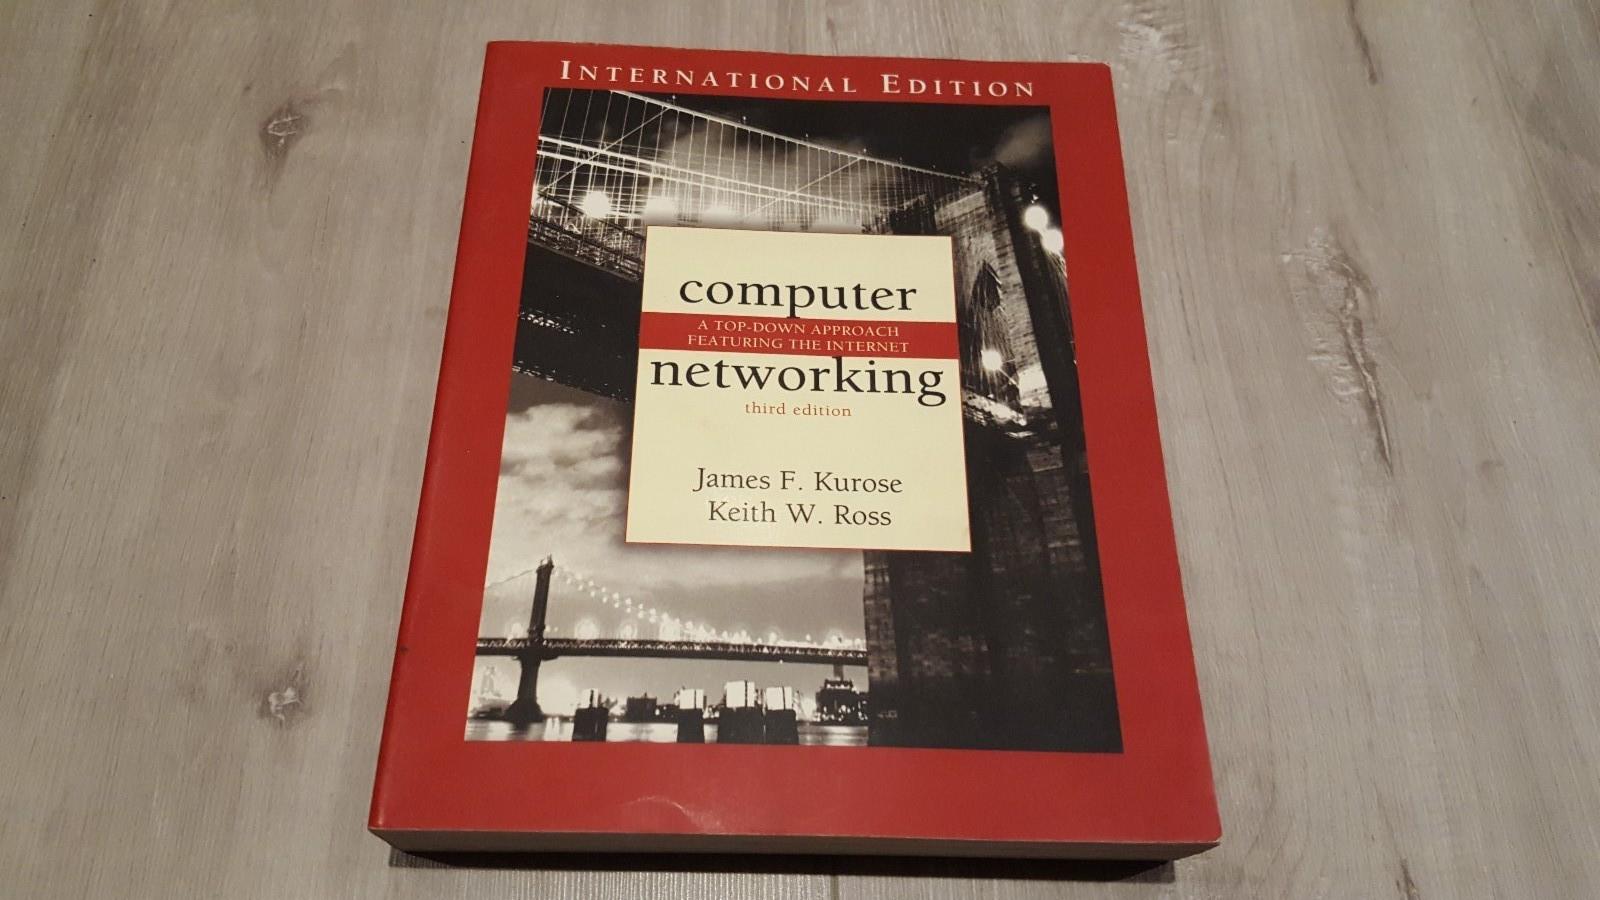 Computer networking, third edition - Sandnes  - Computer networking, third edition, a top-down approach featuring the internet. av James F. Kurose & Keith W. Ross  Pent brukt, i god stand.  ISBN 0-321-26976-4 (0321269764) - Sandnes